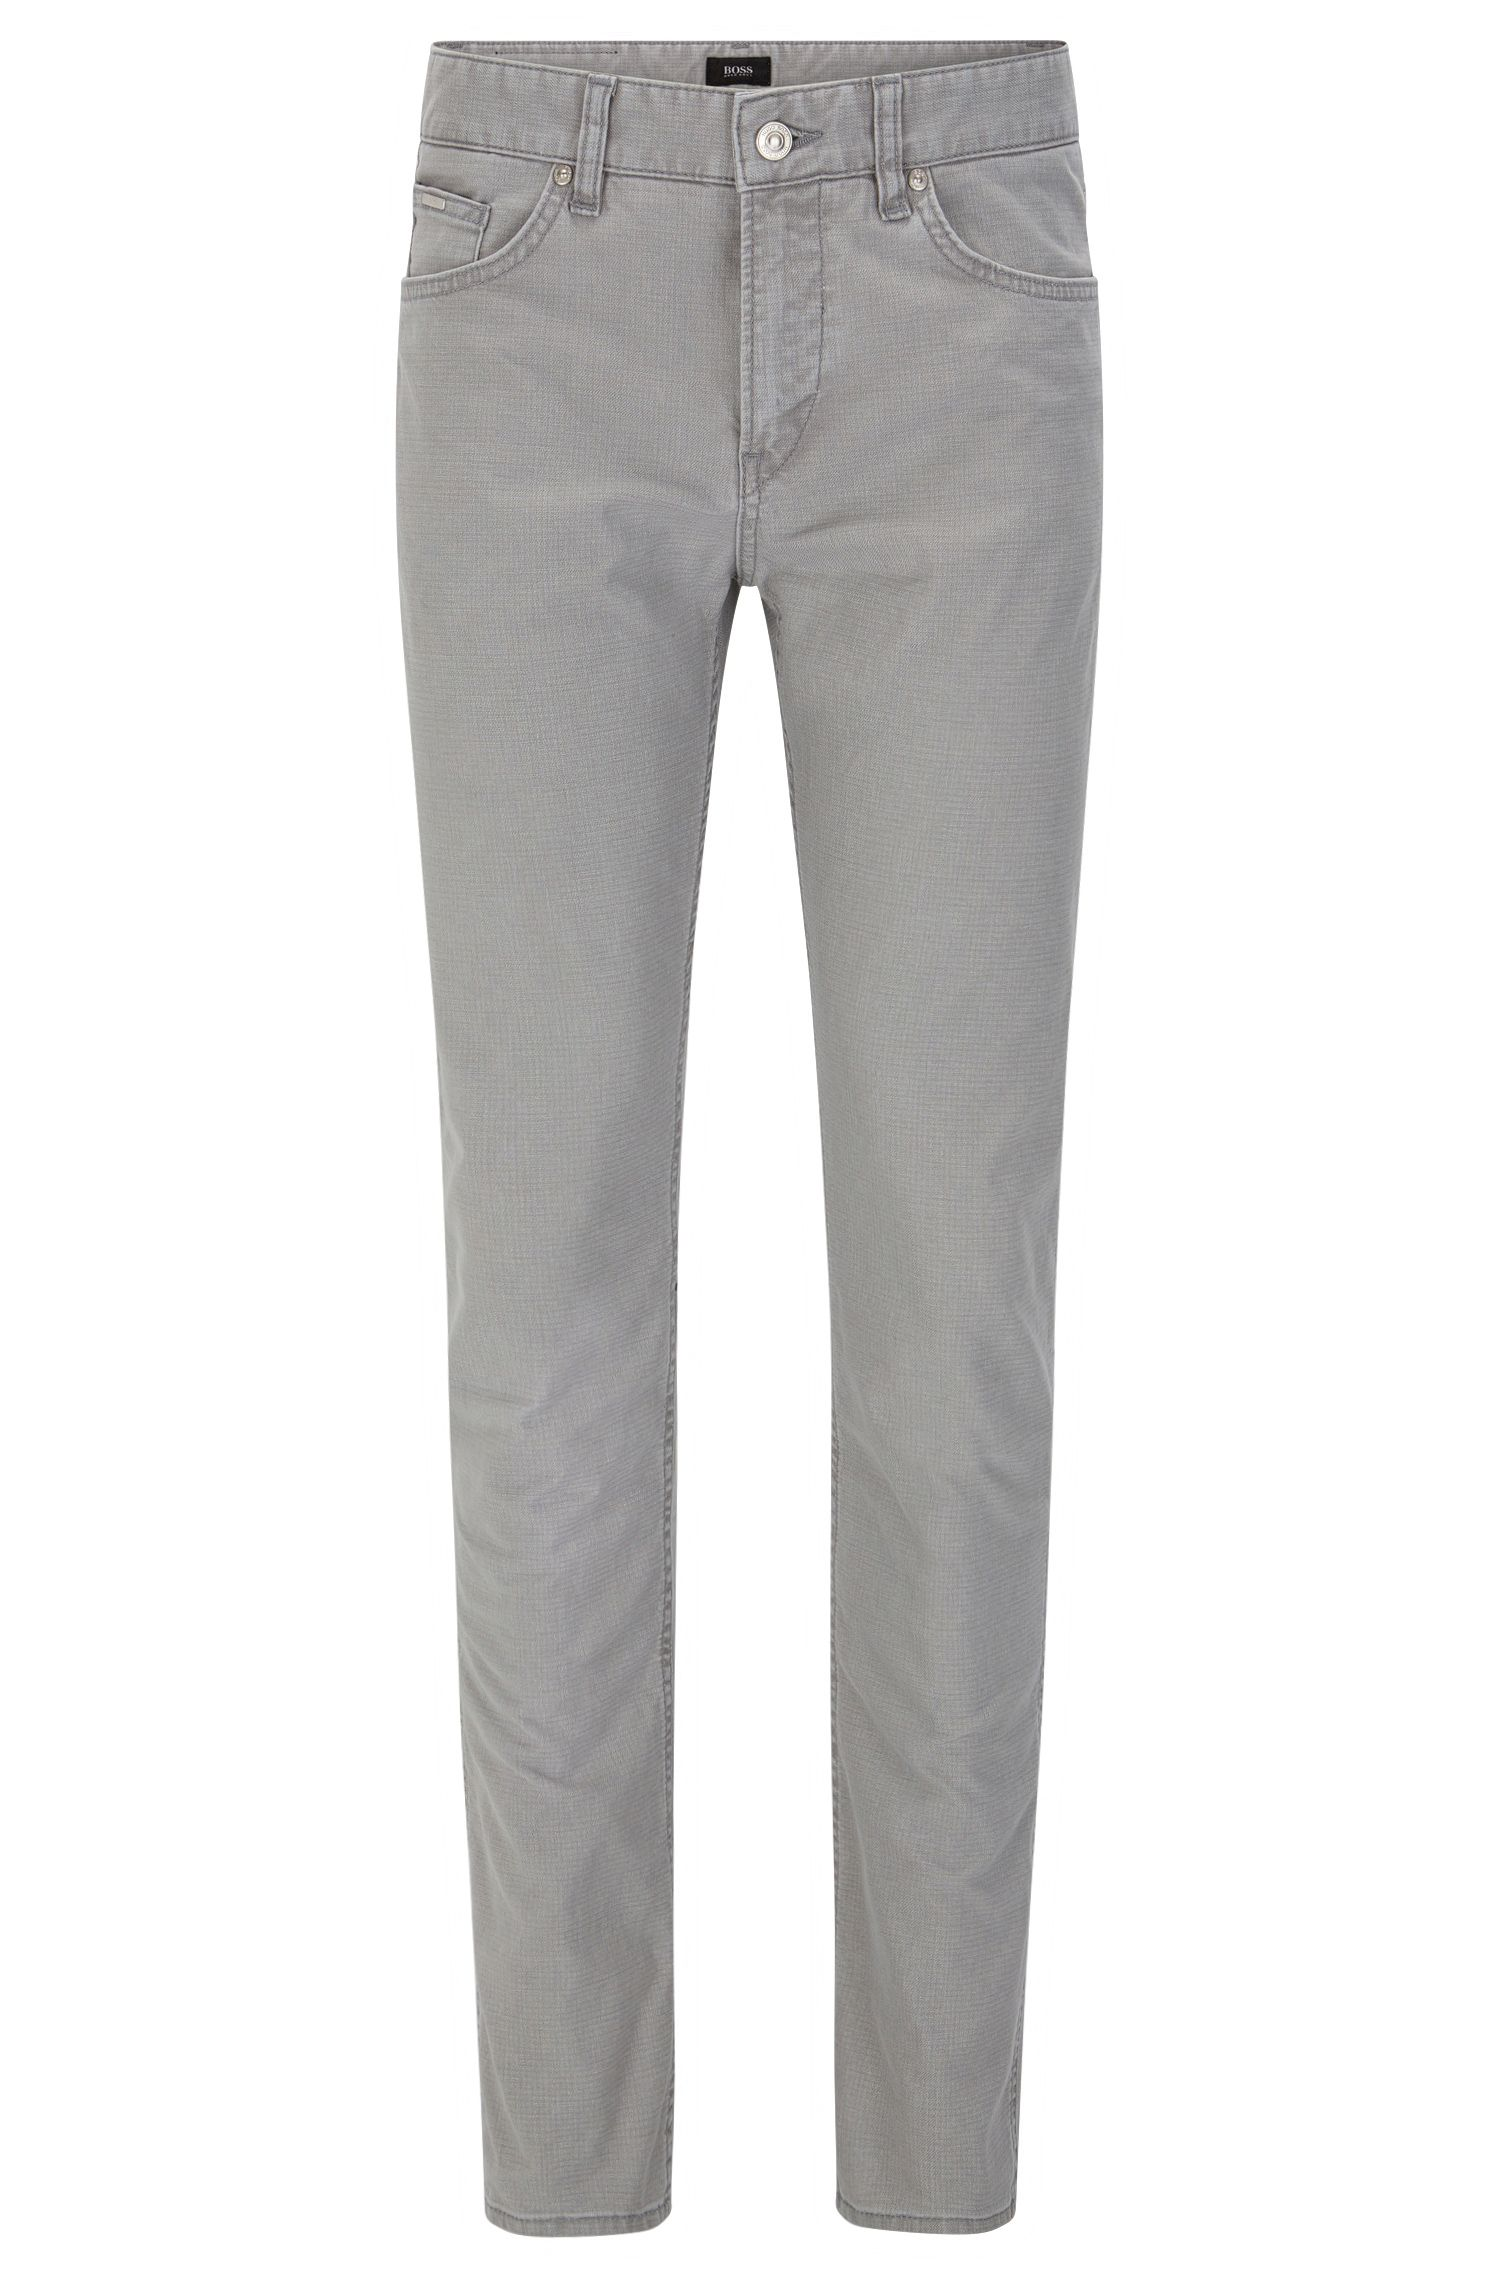 'Delaware' | Slim Fit, 10 oz Stretch Cotton Contrast Trousers